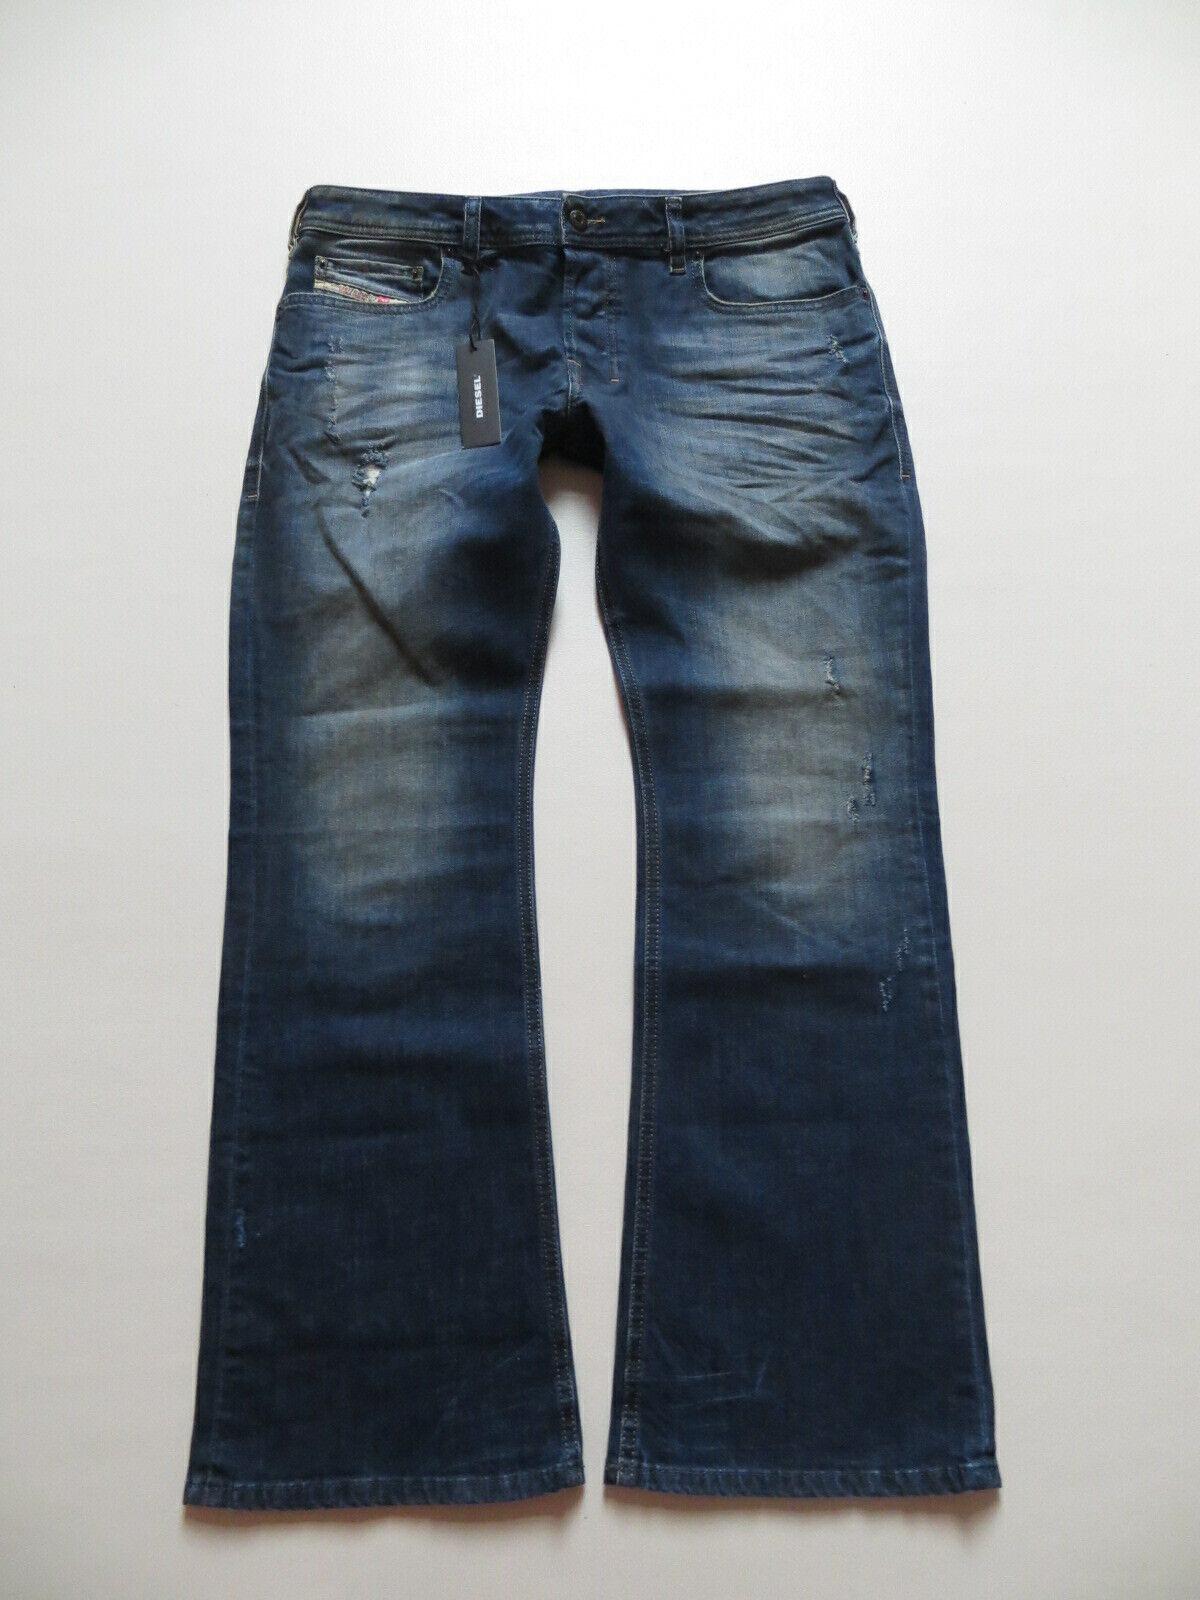 Diesel ZATHAN Stiefelcut Jeans Hose W 34  L 30 NEU   wash R833F_stretch KULT